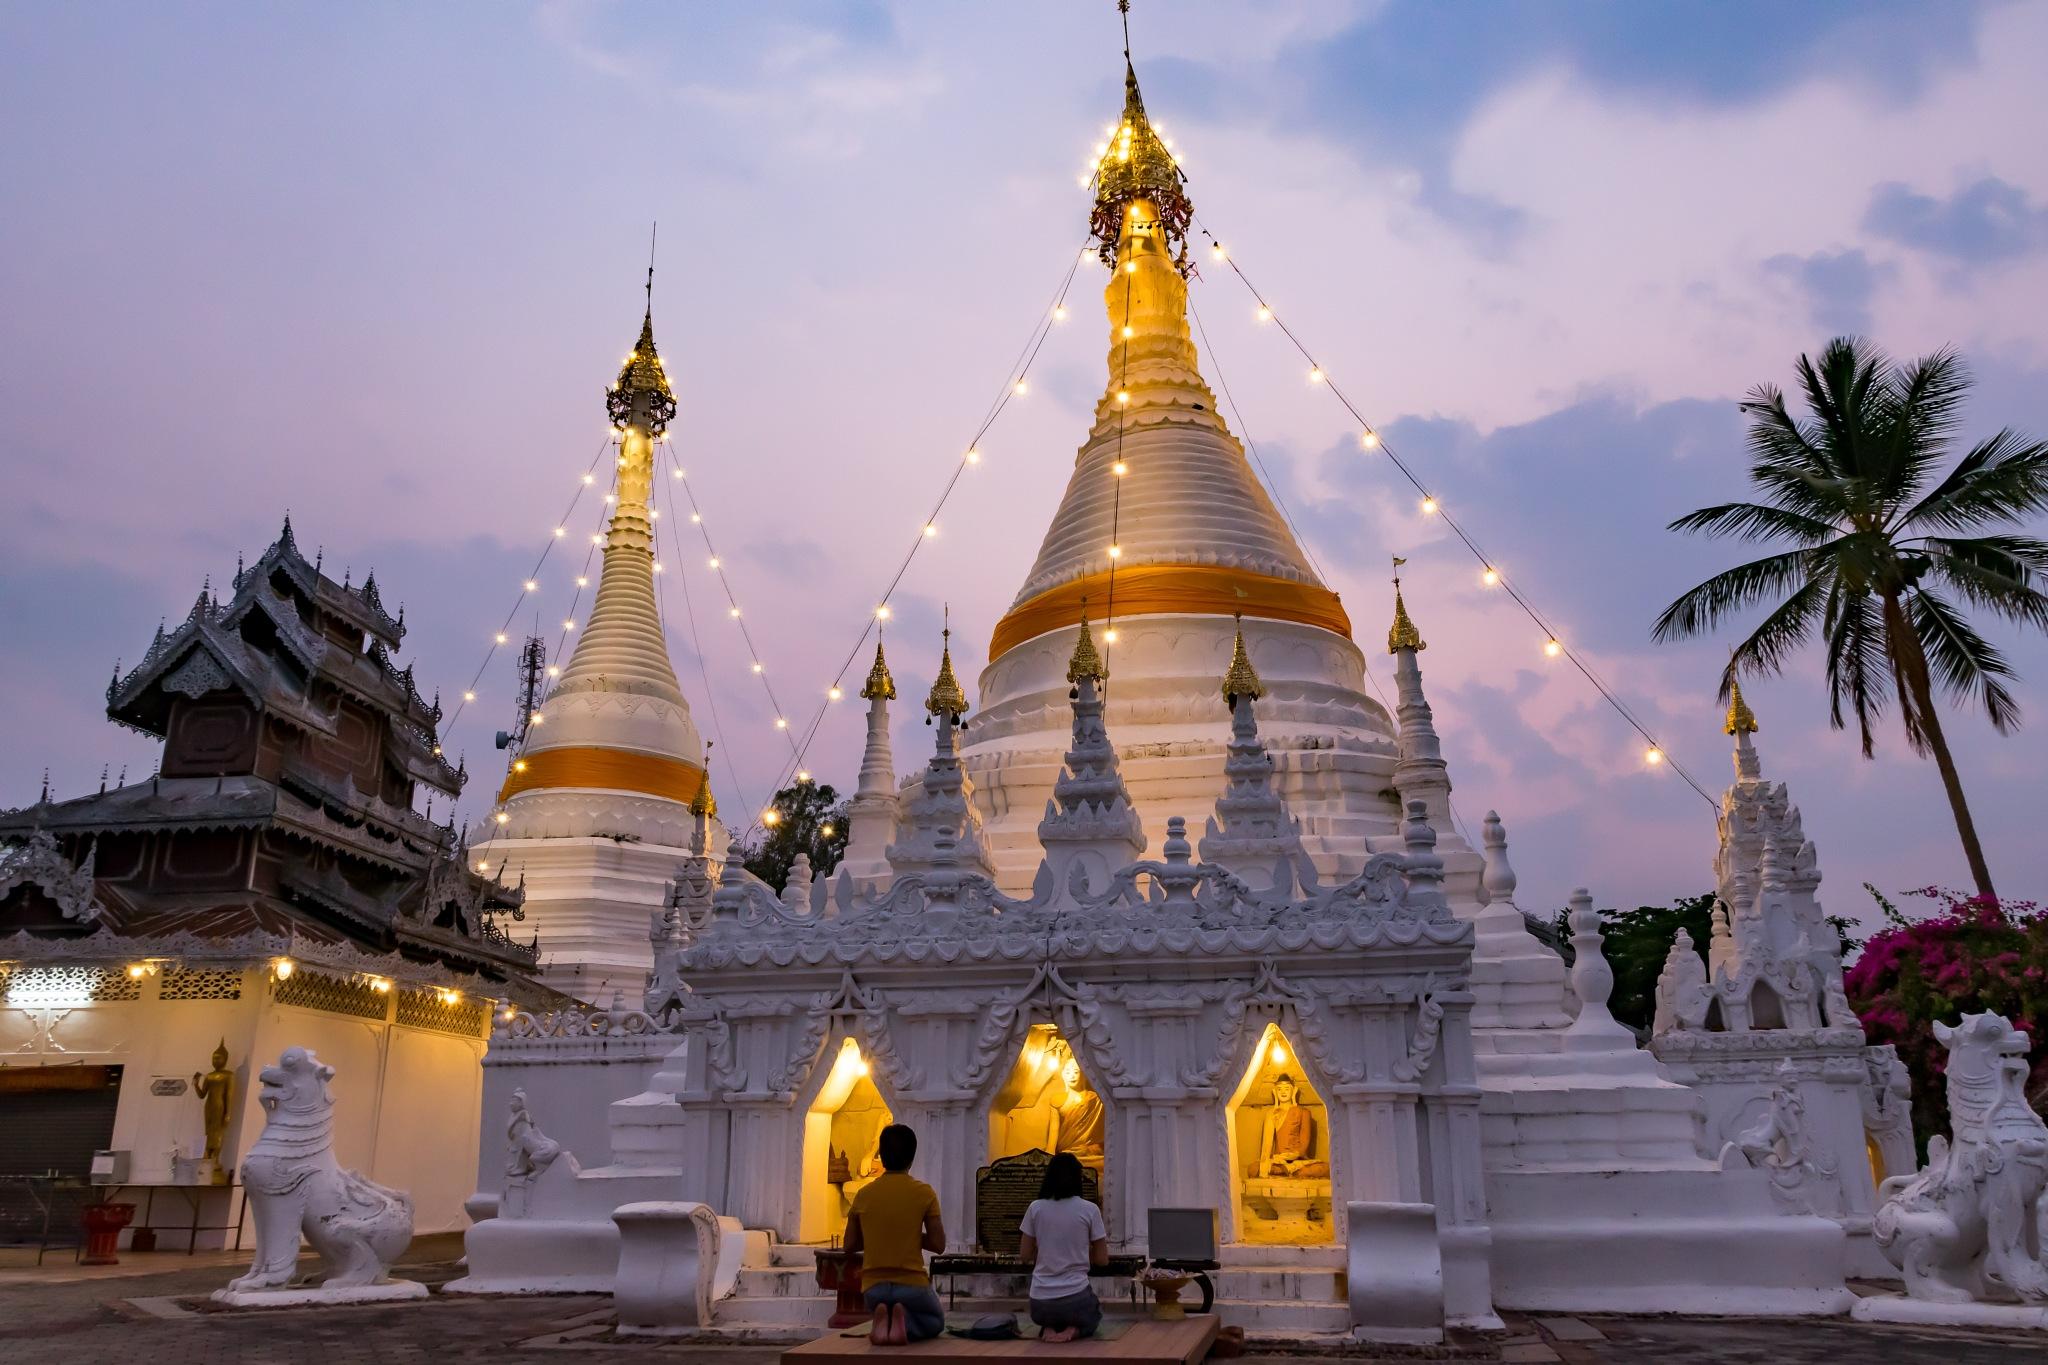 Praying in the Pagoda by Jose Miguel Moya Gonzalez